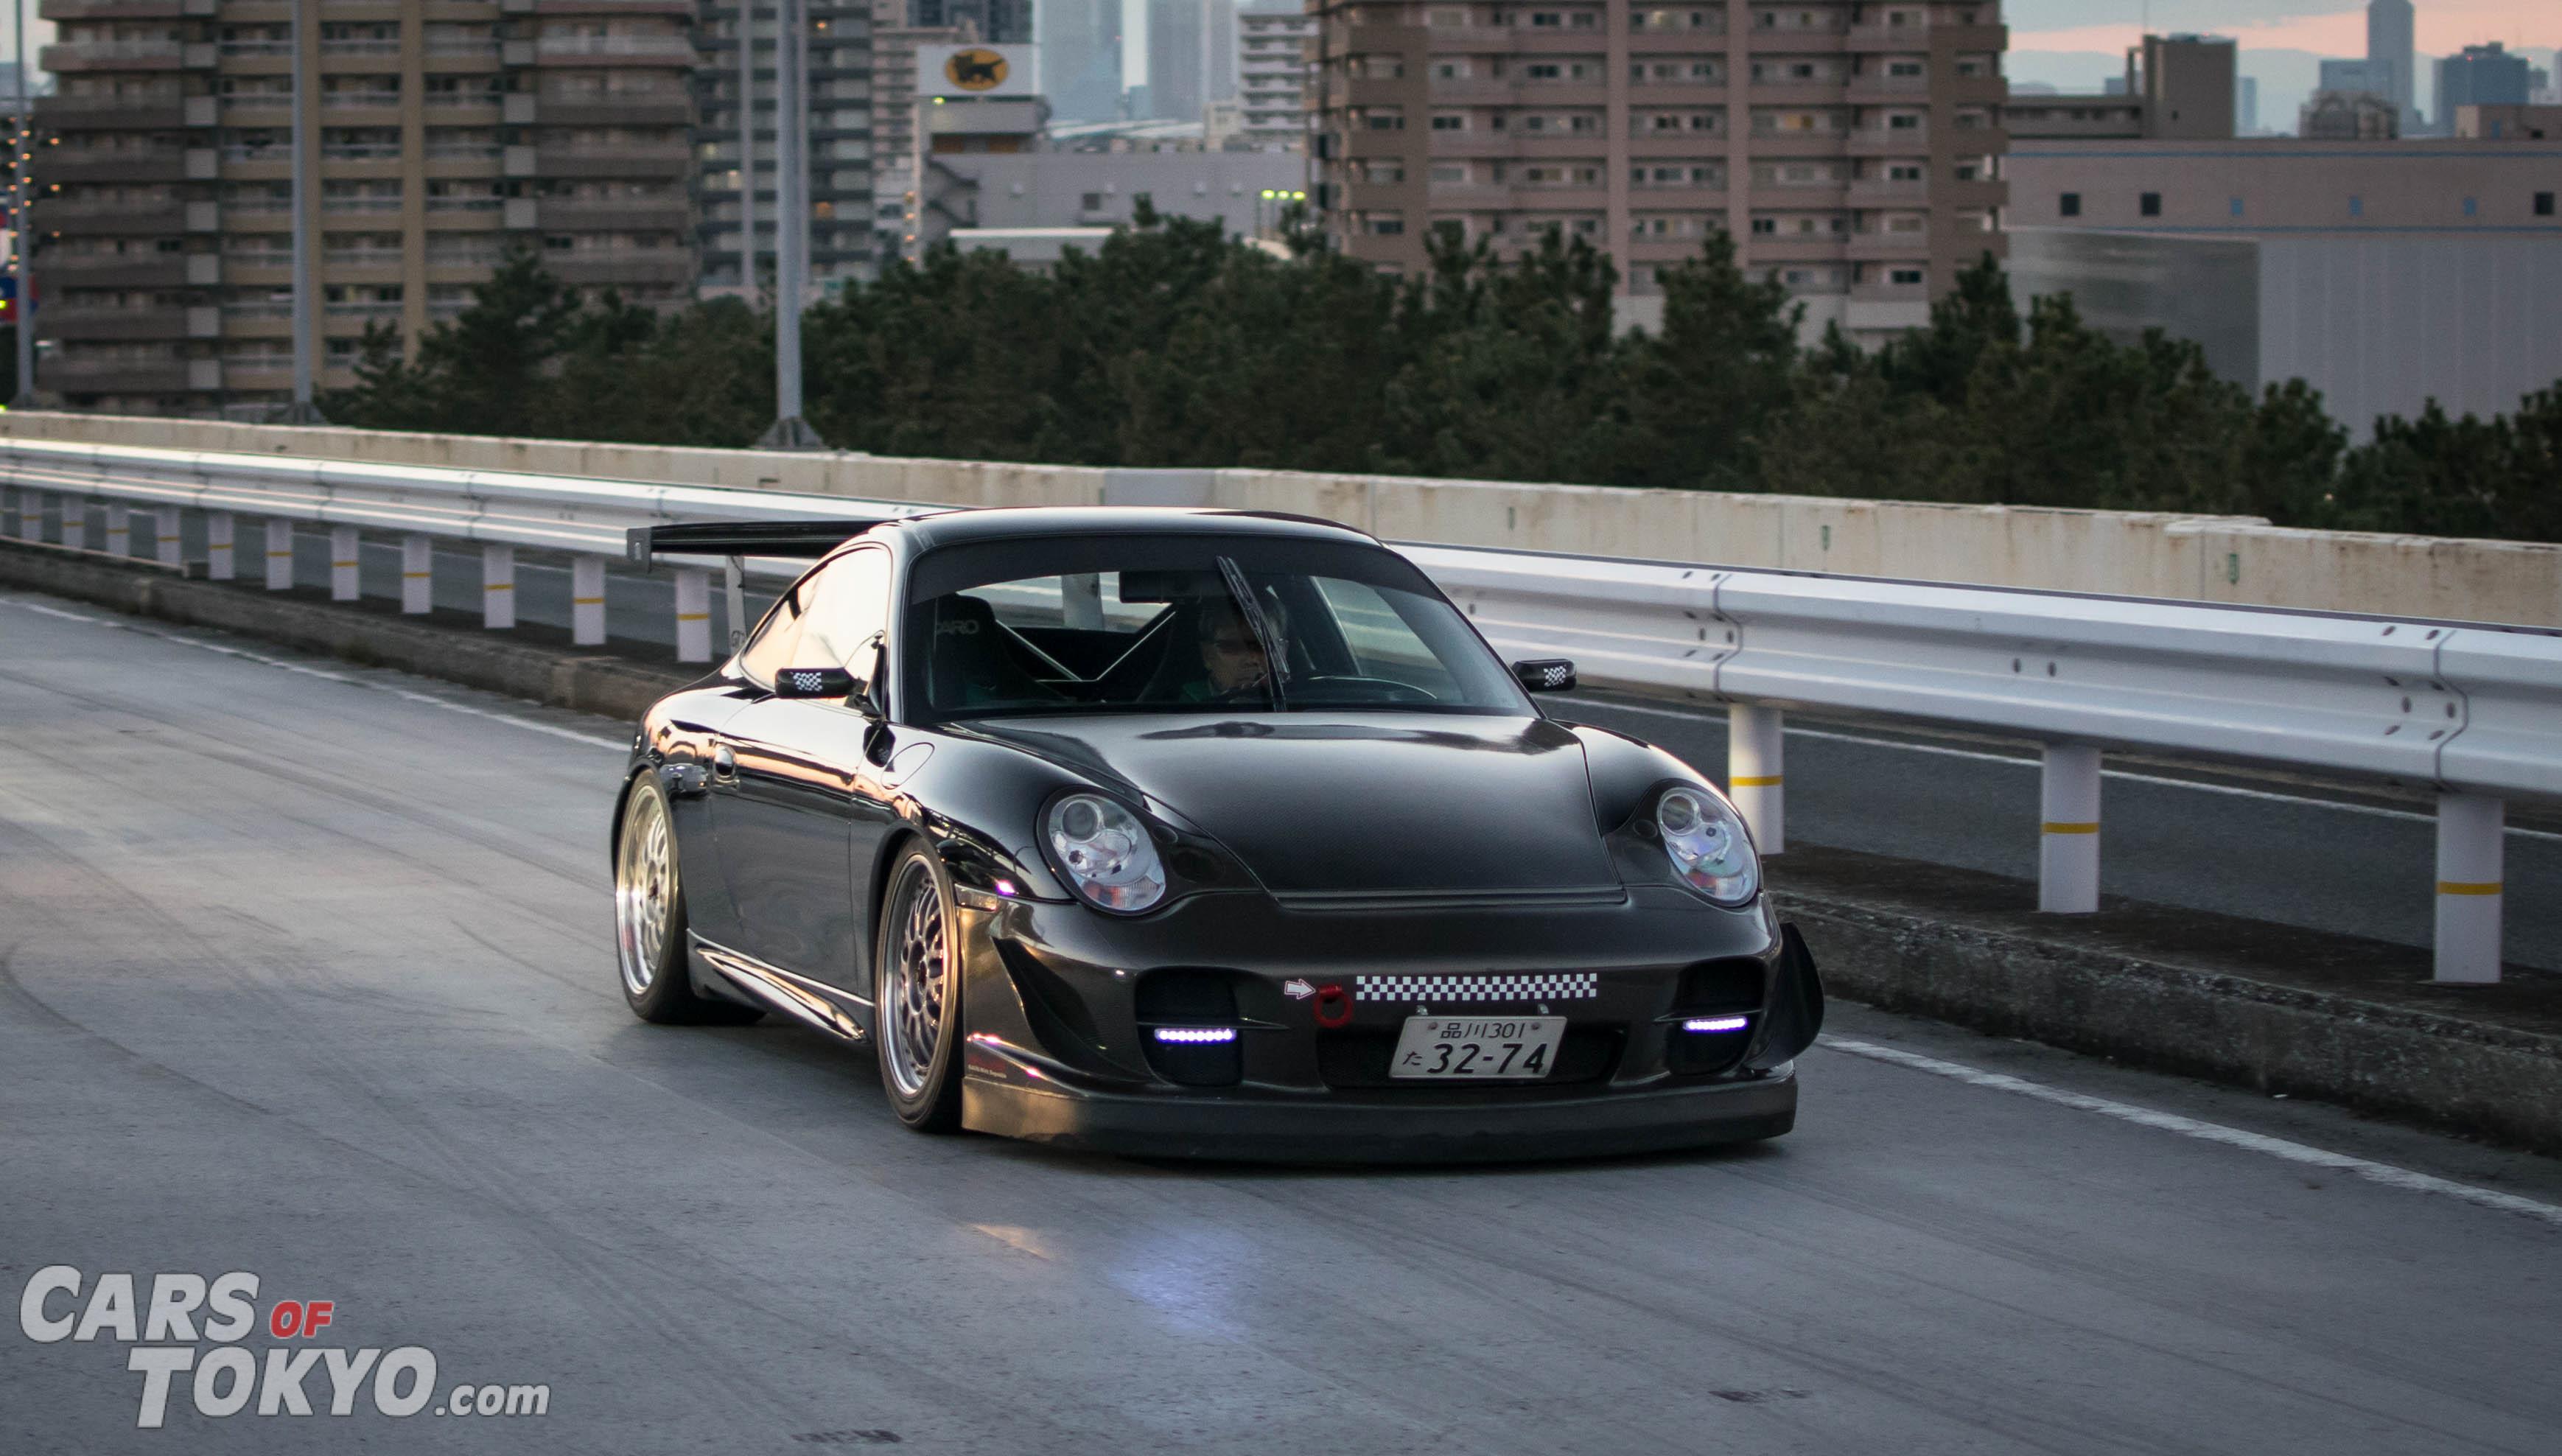 Cars of Tokyo Tatsumi Porsche 911 GT3 Cup